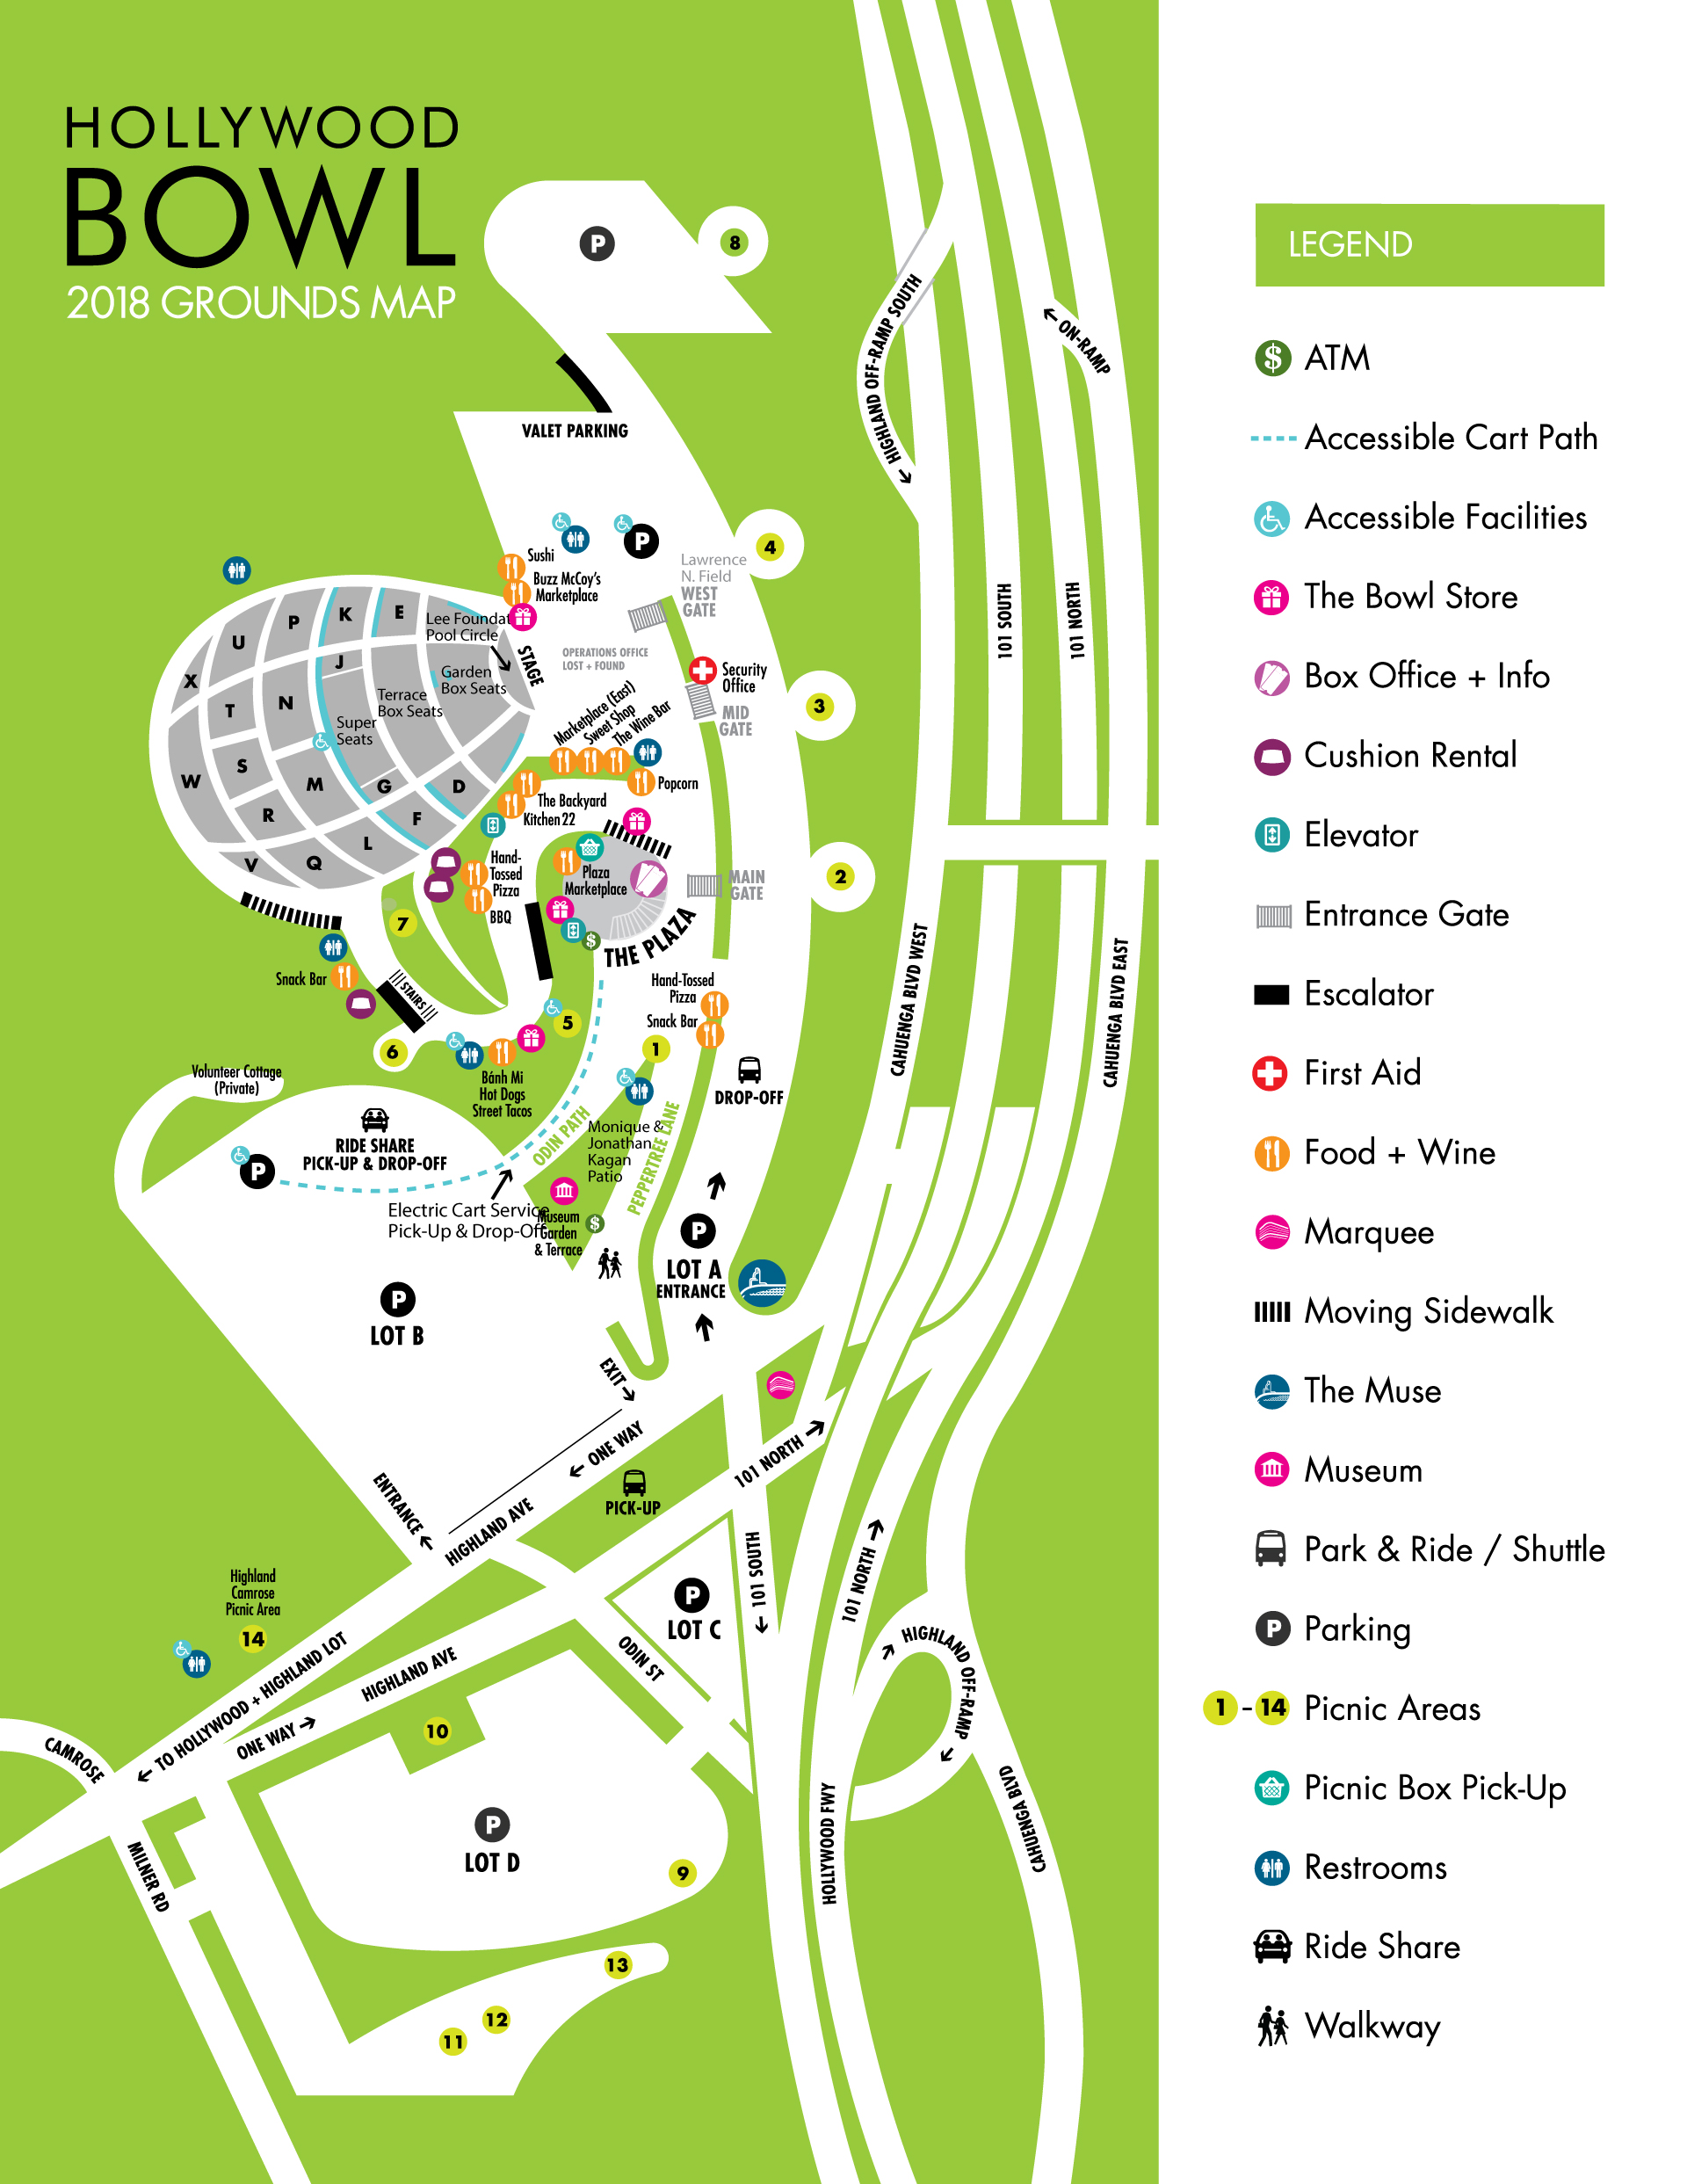 Hollywood Bowl Map Picknicking | Hollywood Bowl